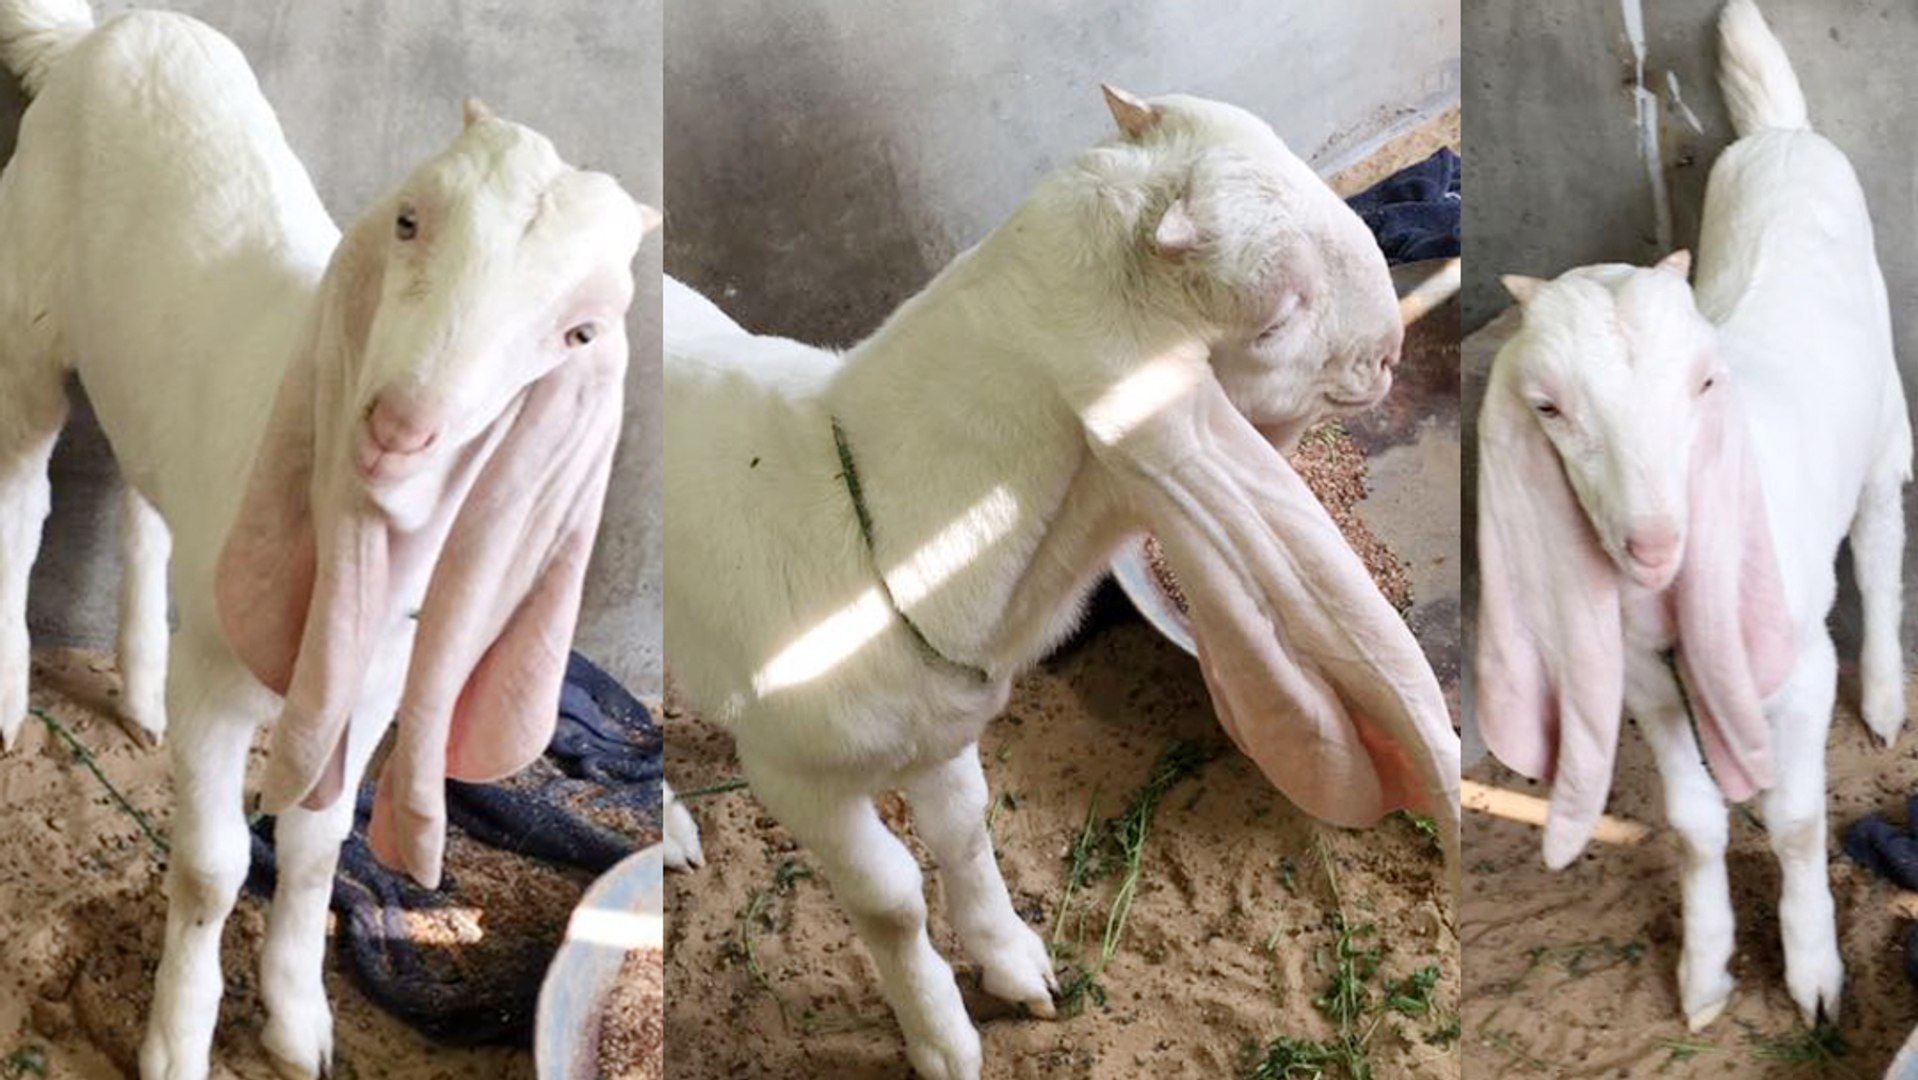 Gulabi Breed Pure Gulabi Goat In Full White Color Long Air Double Bone Karachi Livestock Goat Market Online Video Dailymotion The gulabi gang (from hindi gulabi, pink) is a vigilante group. gulabi breed pure gulabi goat in full white color long air double bone karachi livestock goat market online